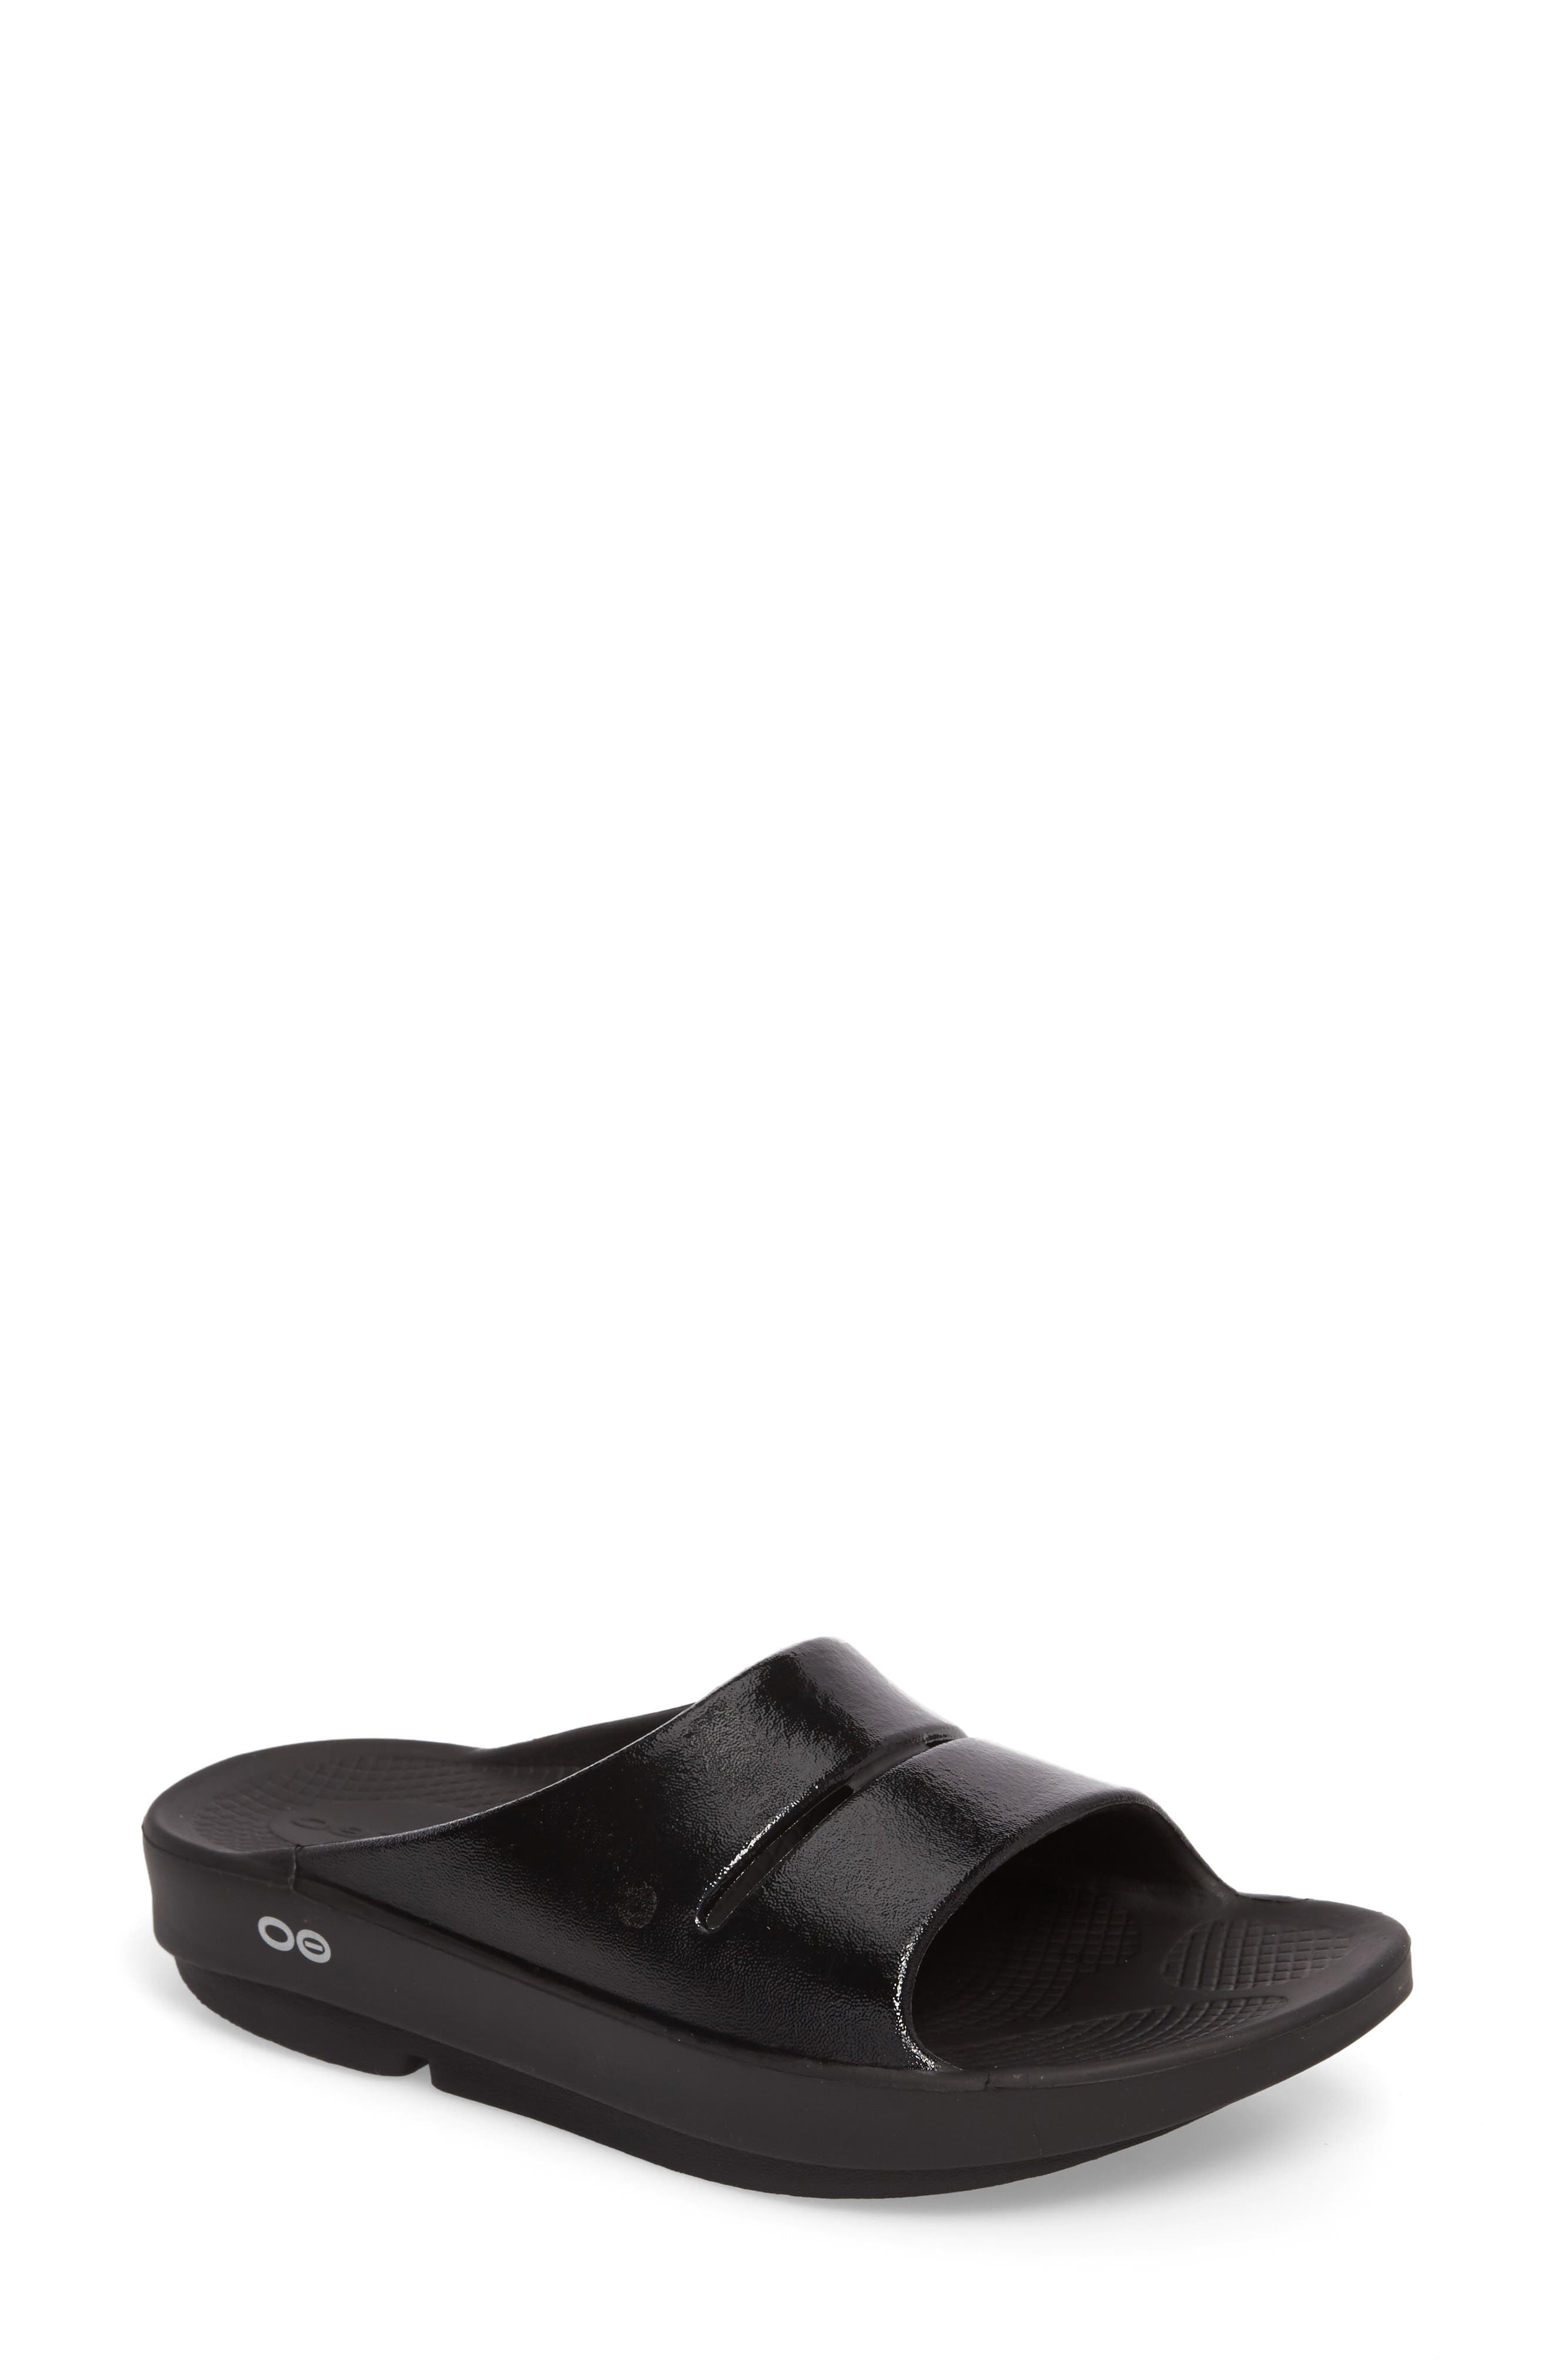 Oofos OOahh Luxe Slide Sandal (Women)